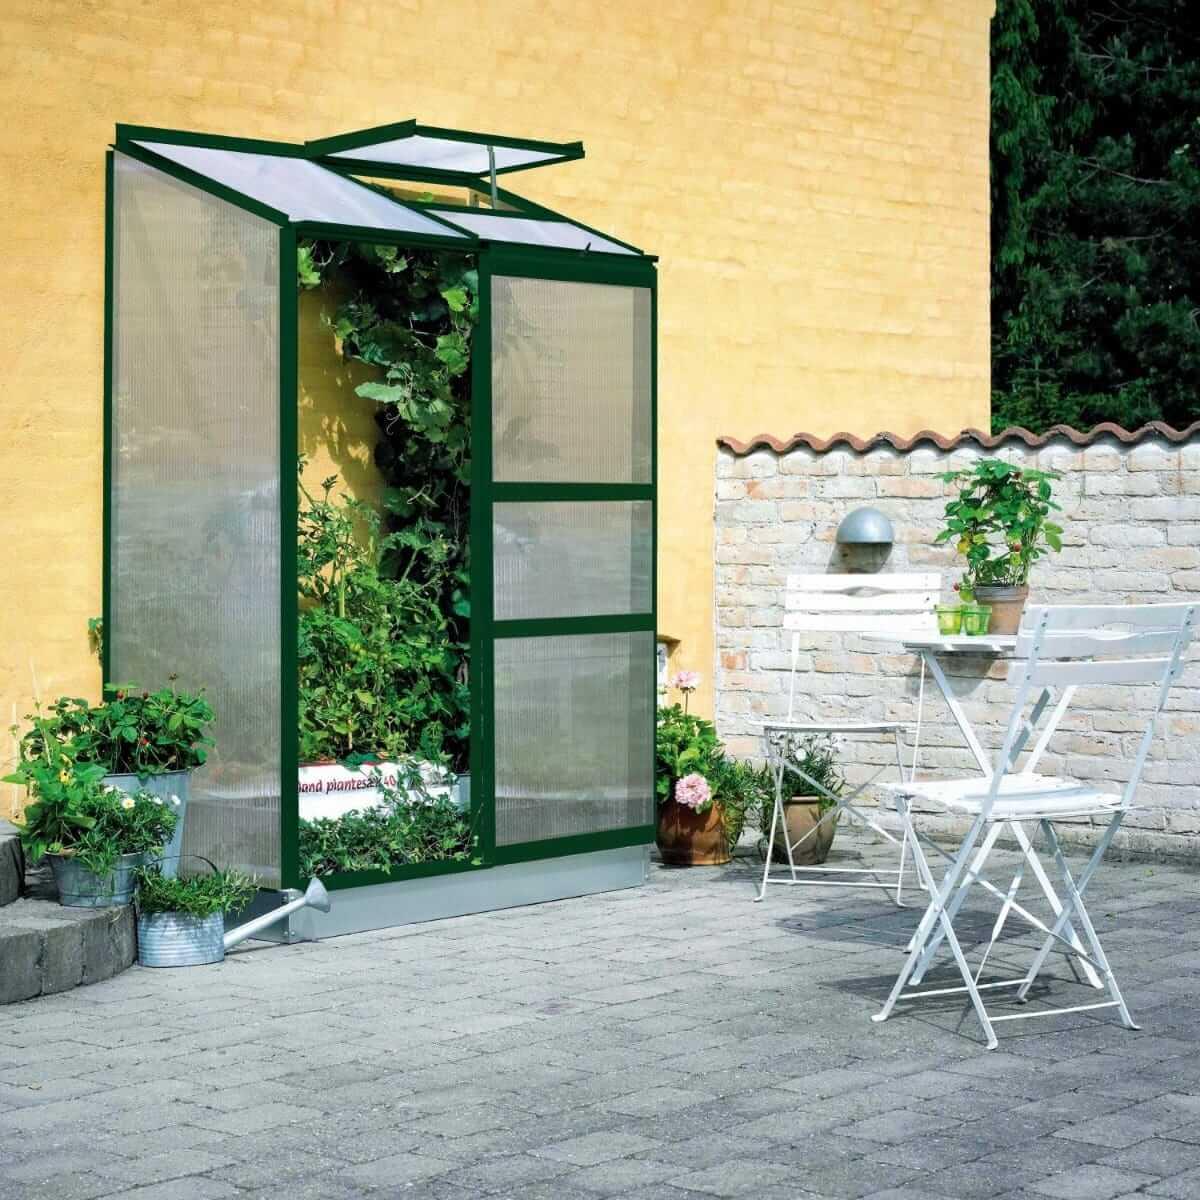 Halls Växthus Altan 2 0,9 kvm Grön Glas